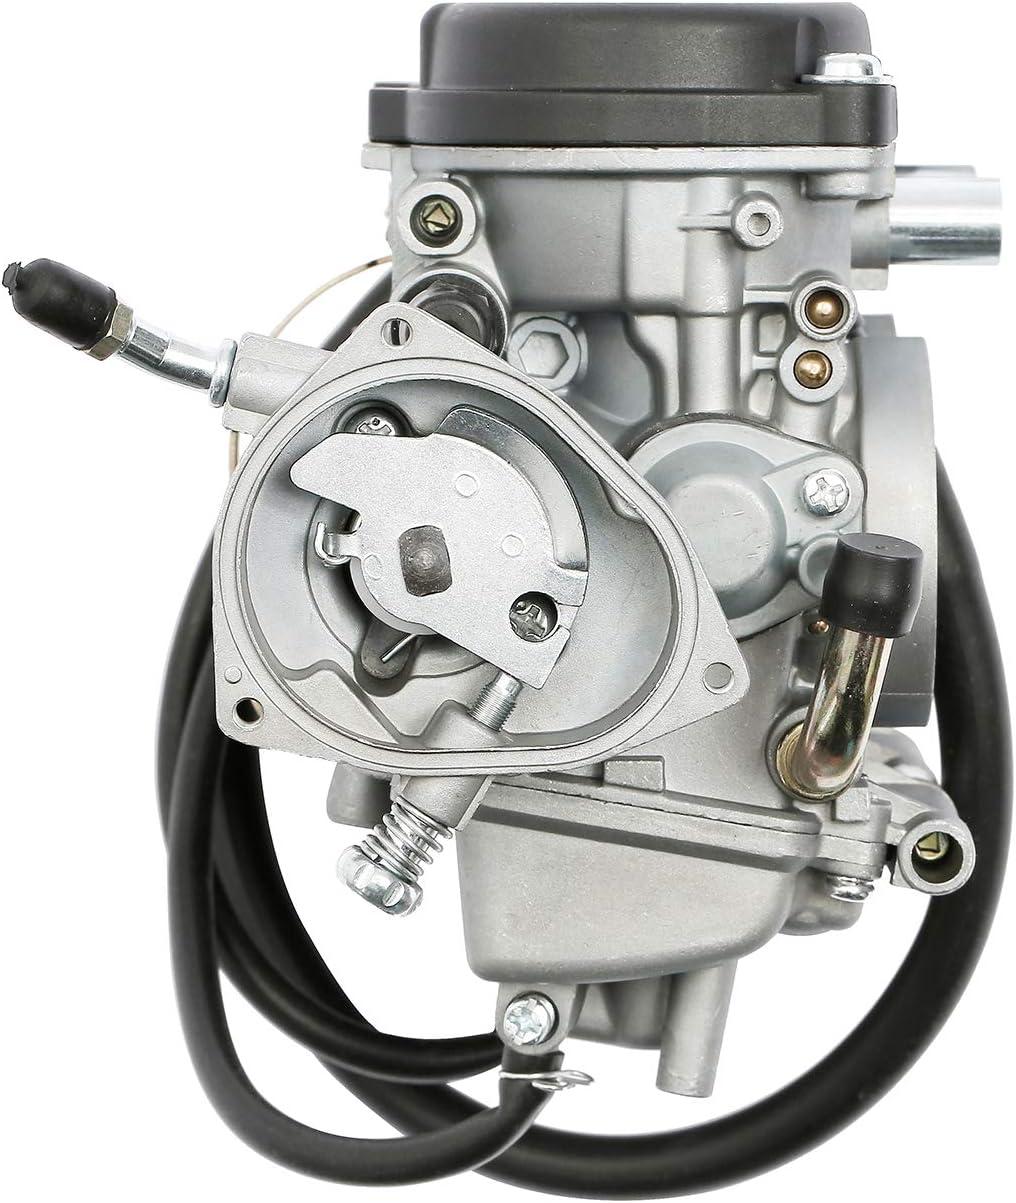 Carburetor for 2001-2005 Yamaha Raptor 660 660R YFM660 YFM 660R Carb